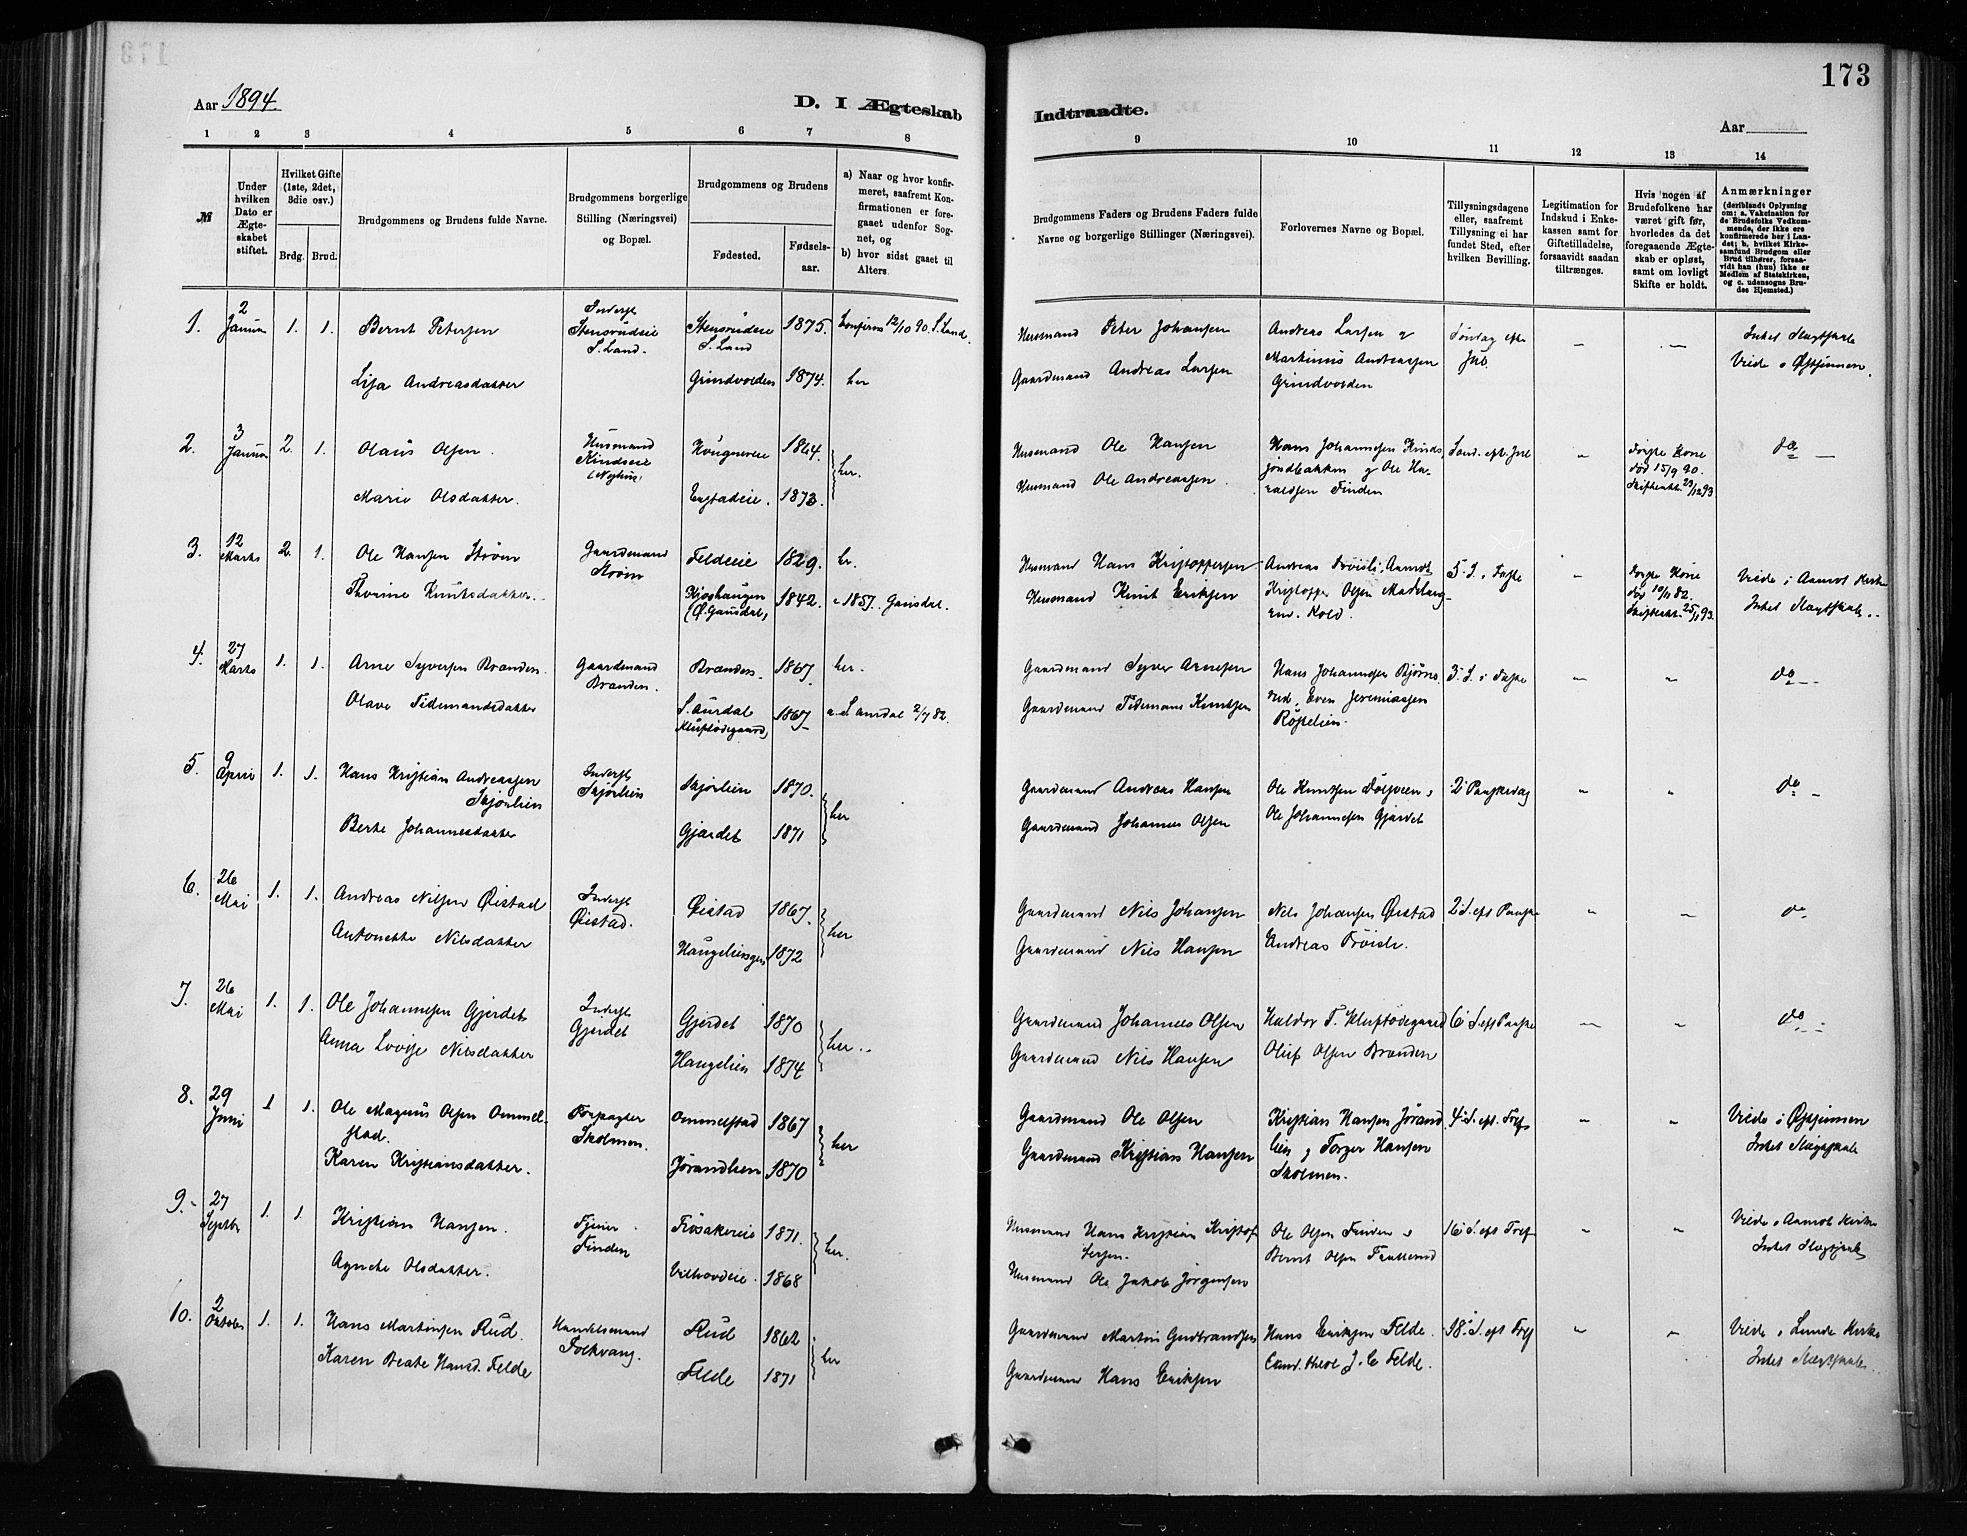 SAH, Nordre Land prestekontor, Ministerialbok nr. 4, 1882-1896, s. 173